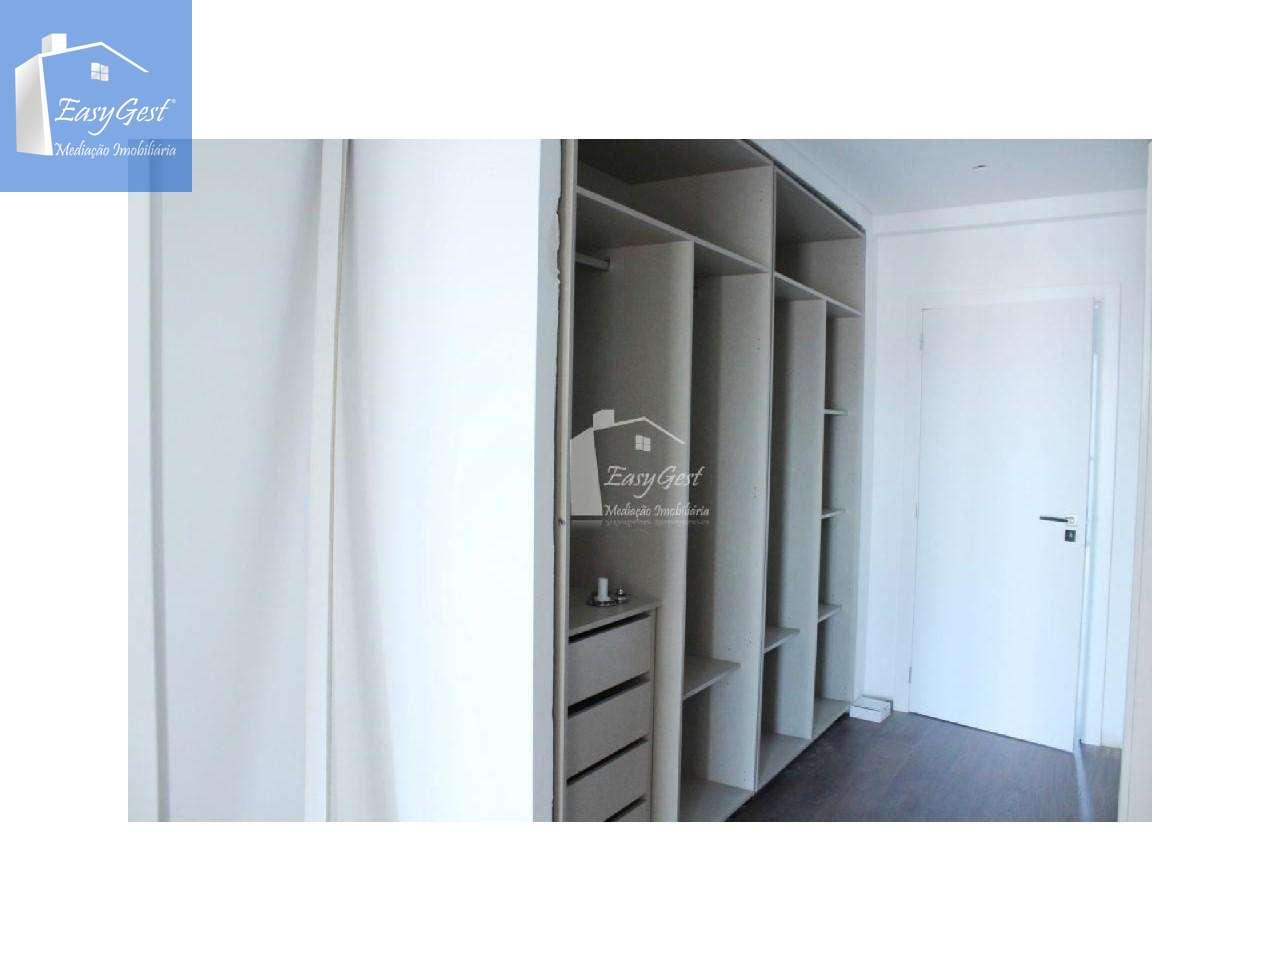 Apartamento para comprar, Corroios, Setúbal - Foto 18